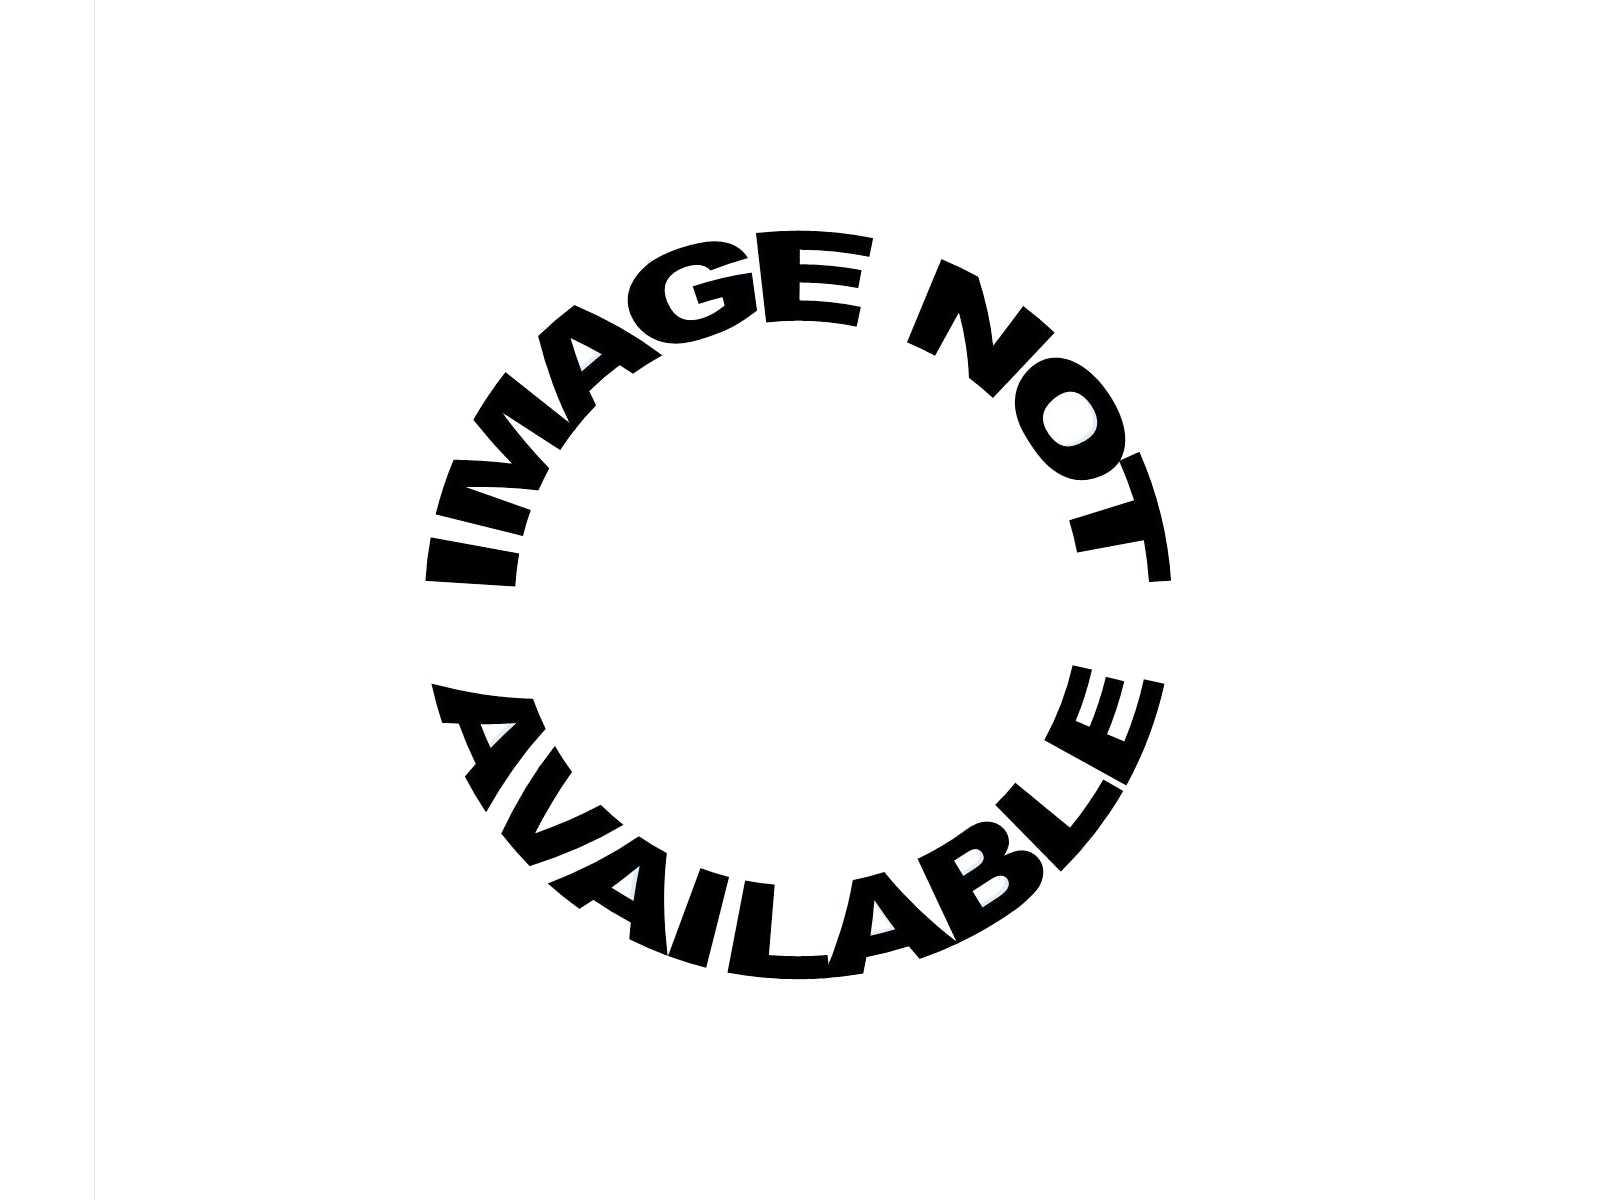 Belts: Case / IH Replacement Belts - 1822 Thru 635 Mod Exp 1546117C1 (B46117C1) for Sale